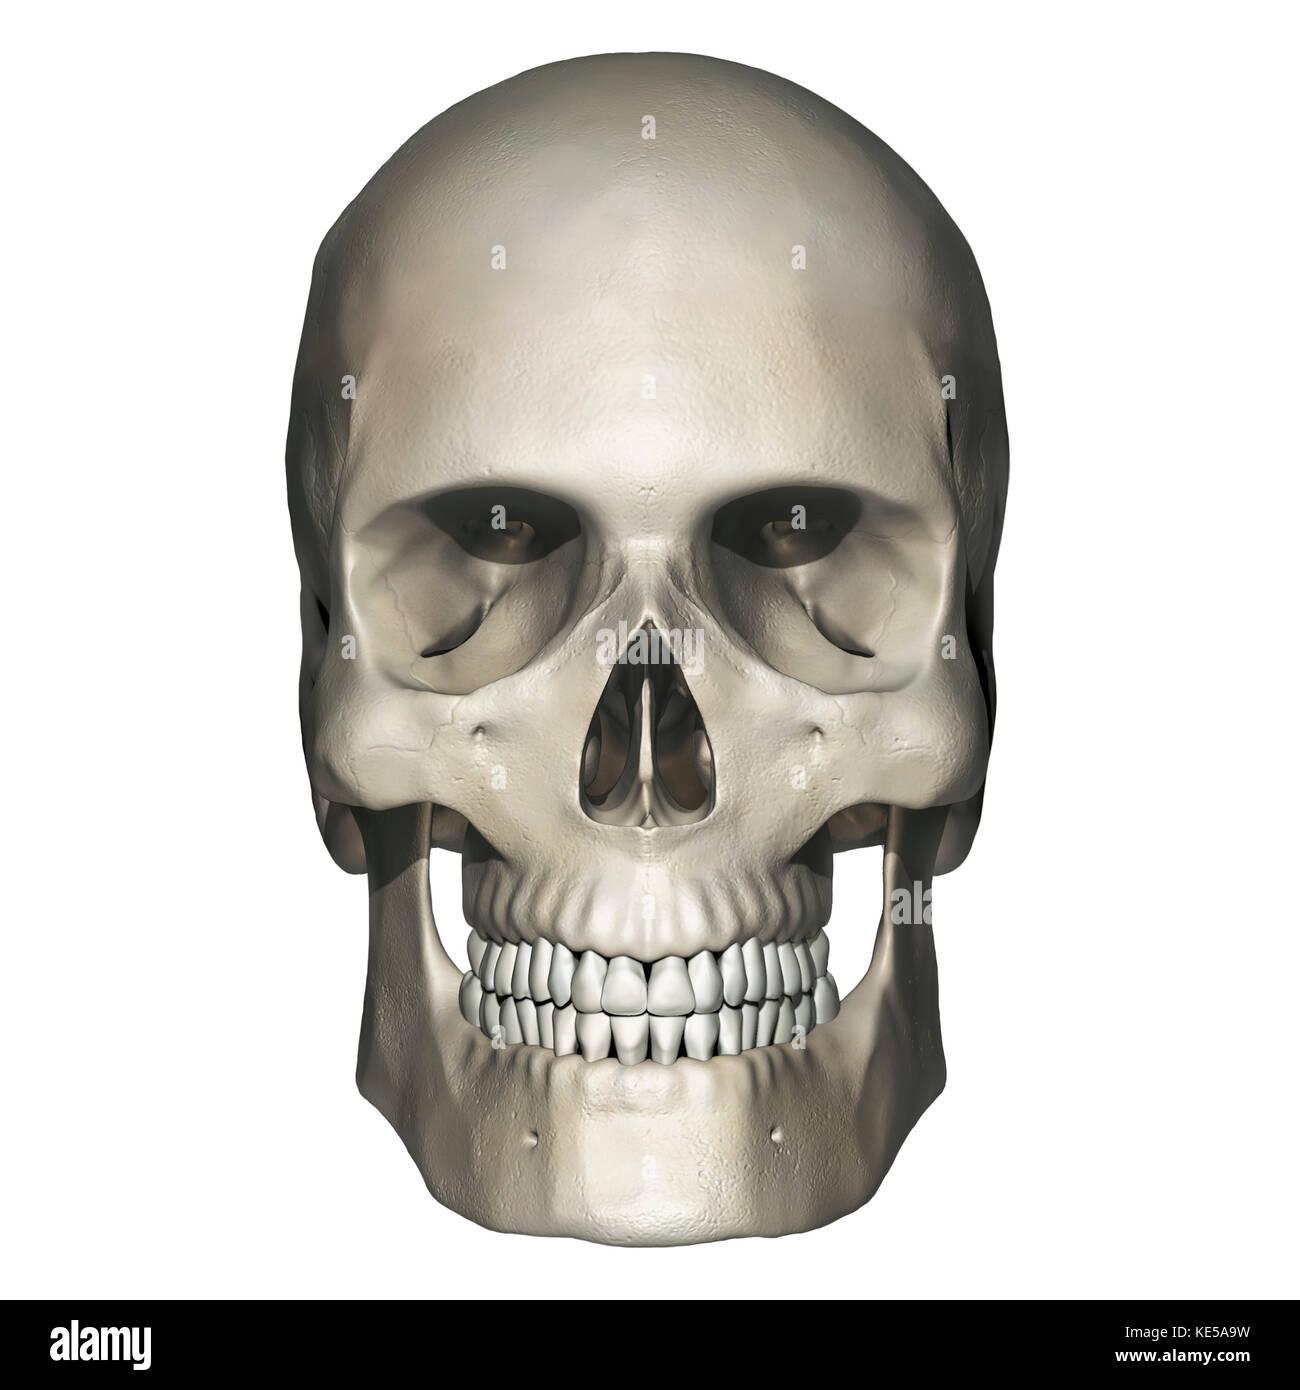 Anterior view of human skull anatomy. - Stock Image